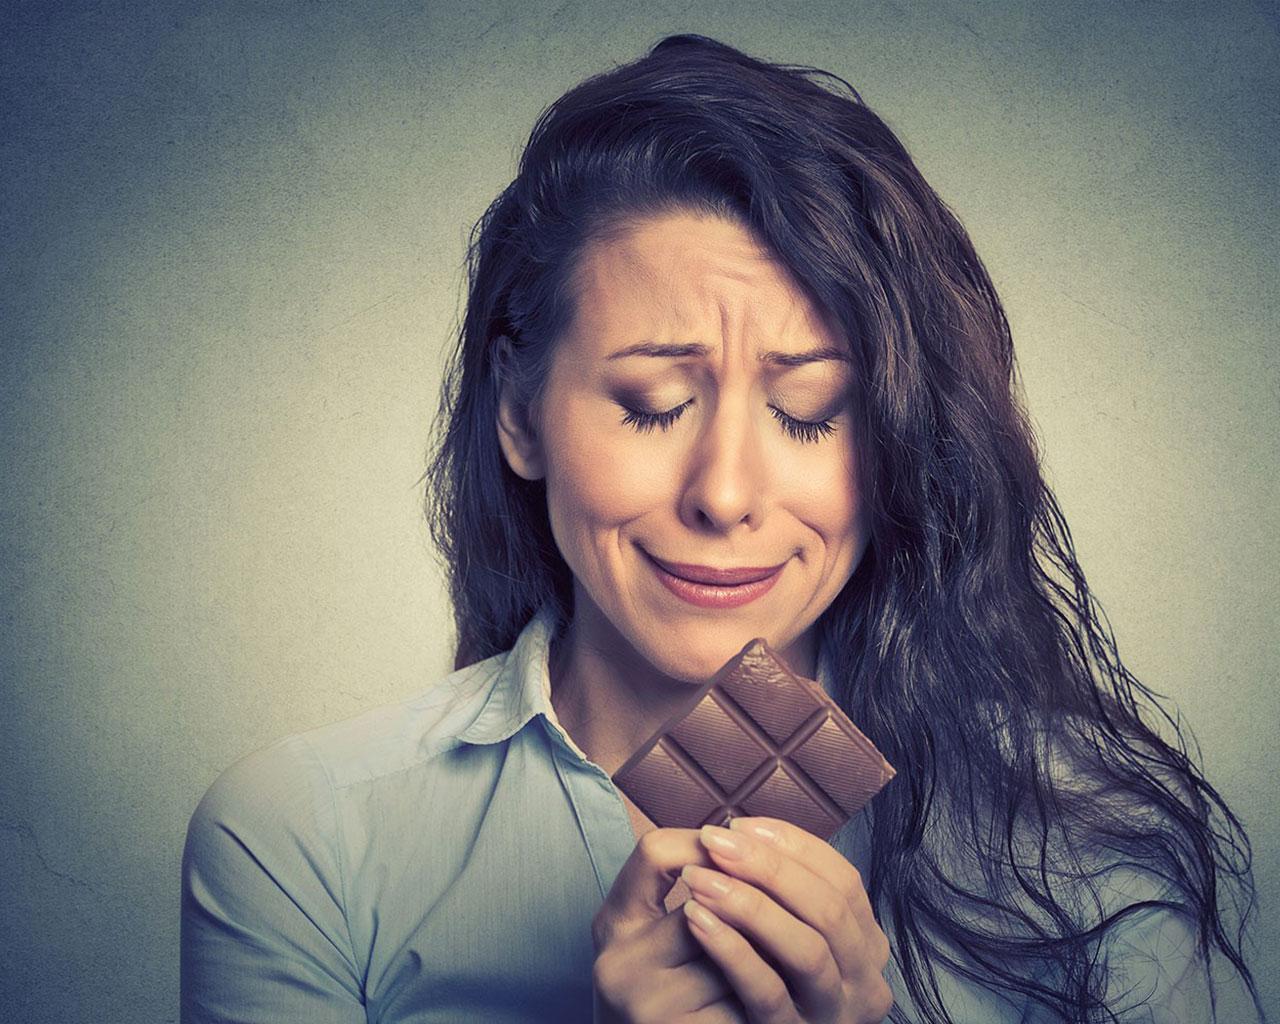 Шоколад снимает стресс